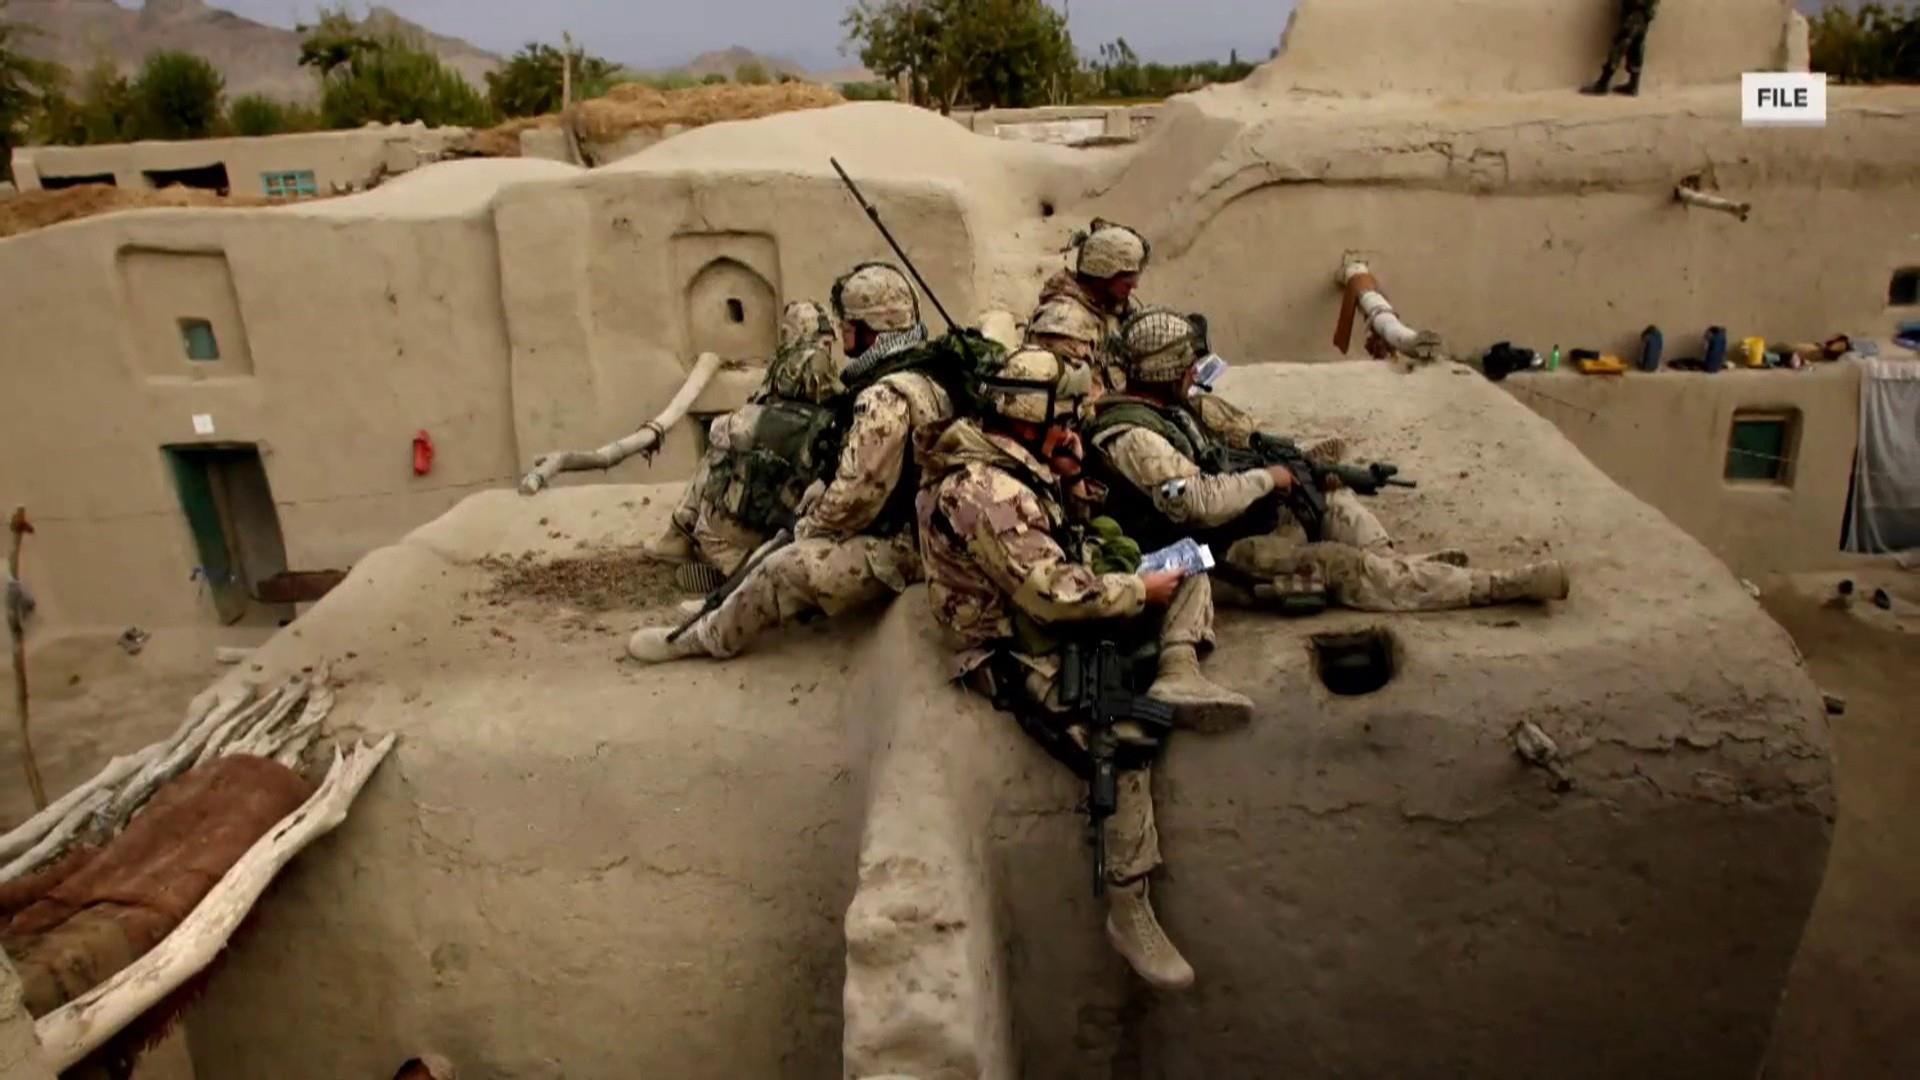 U.S. says two troops killed in combat in Afghanistan